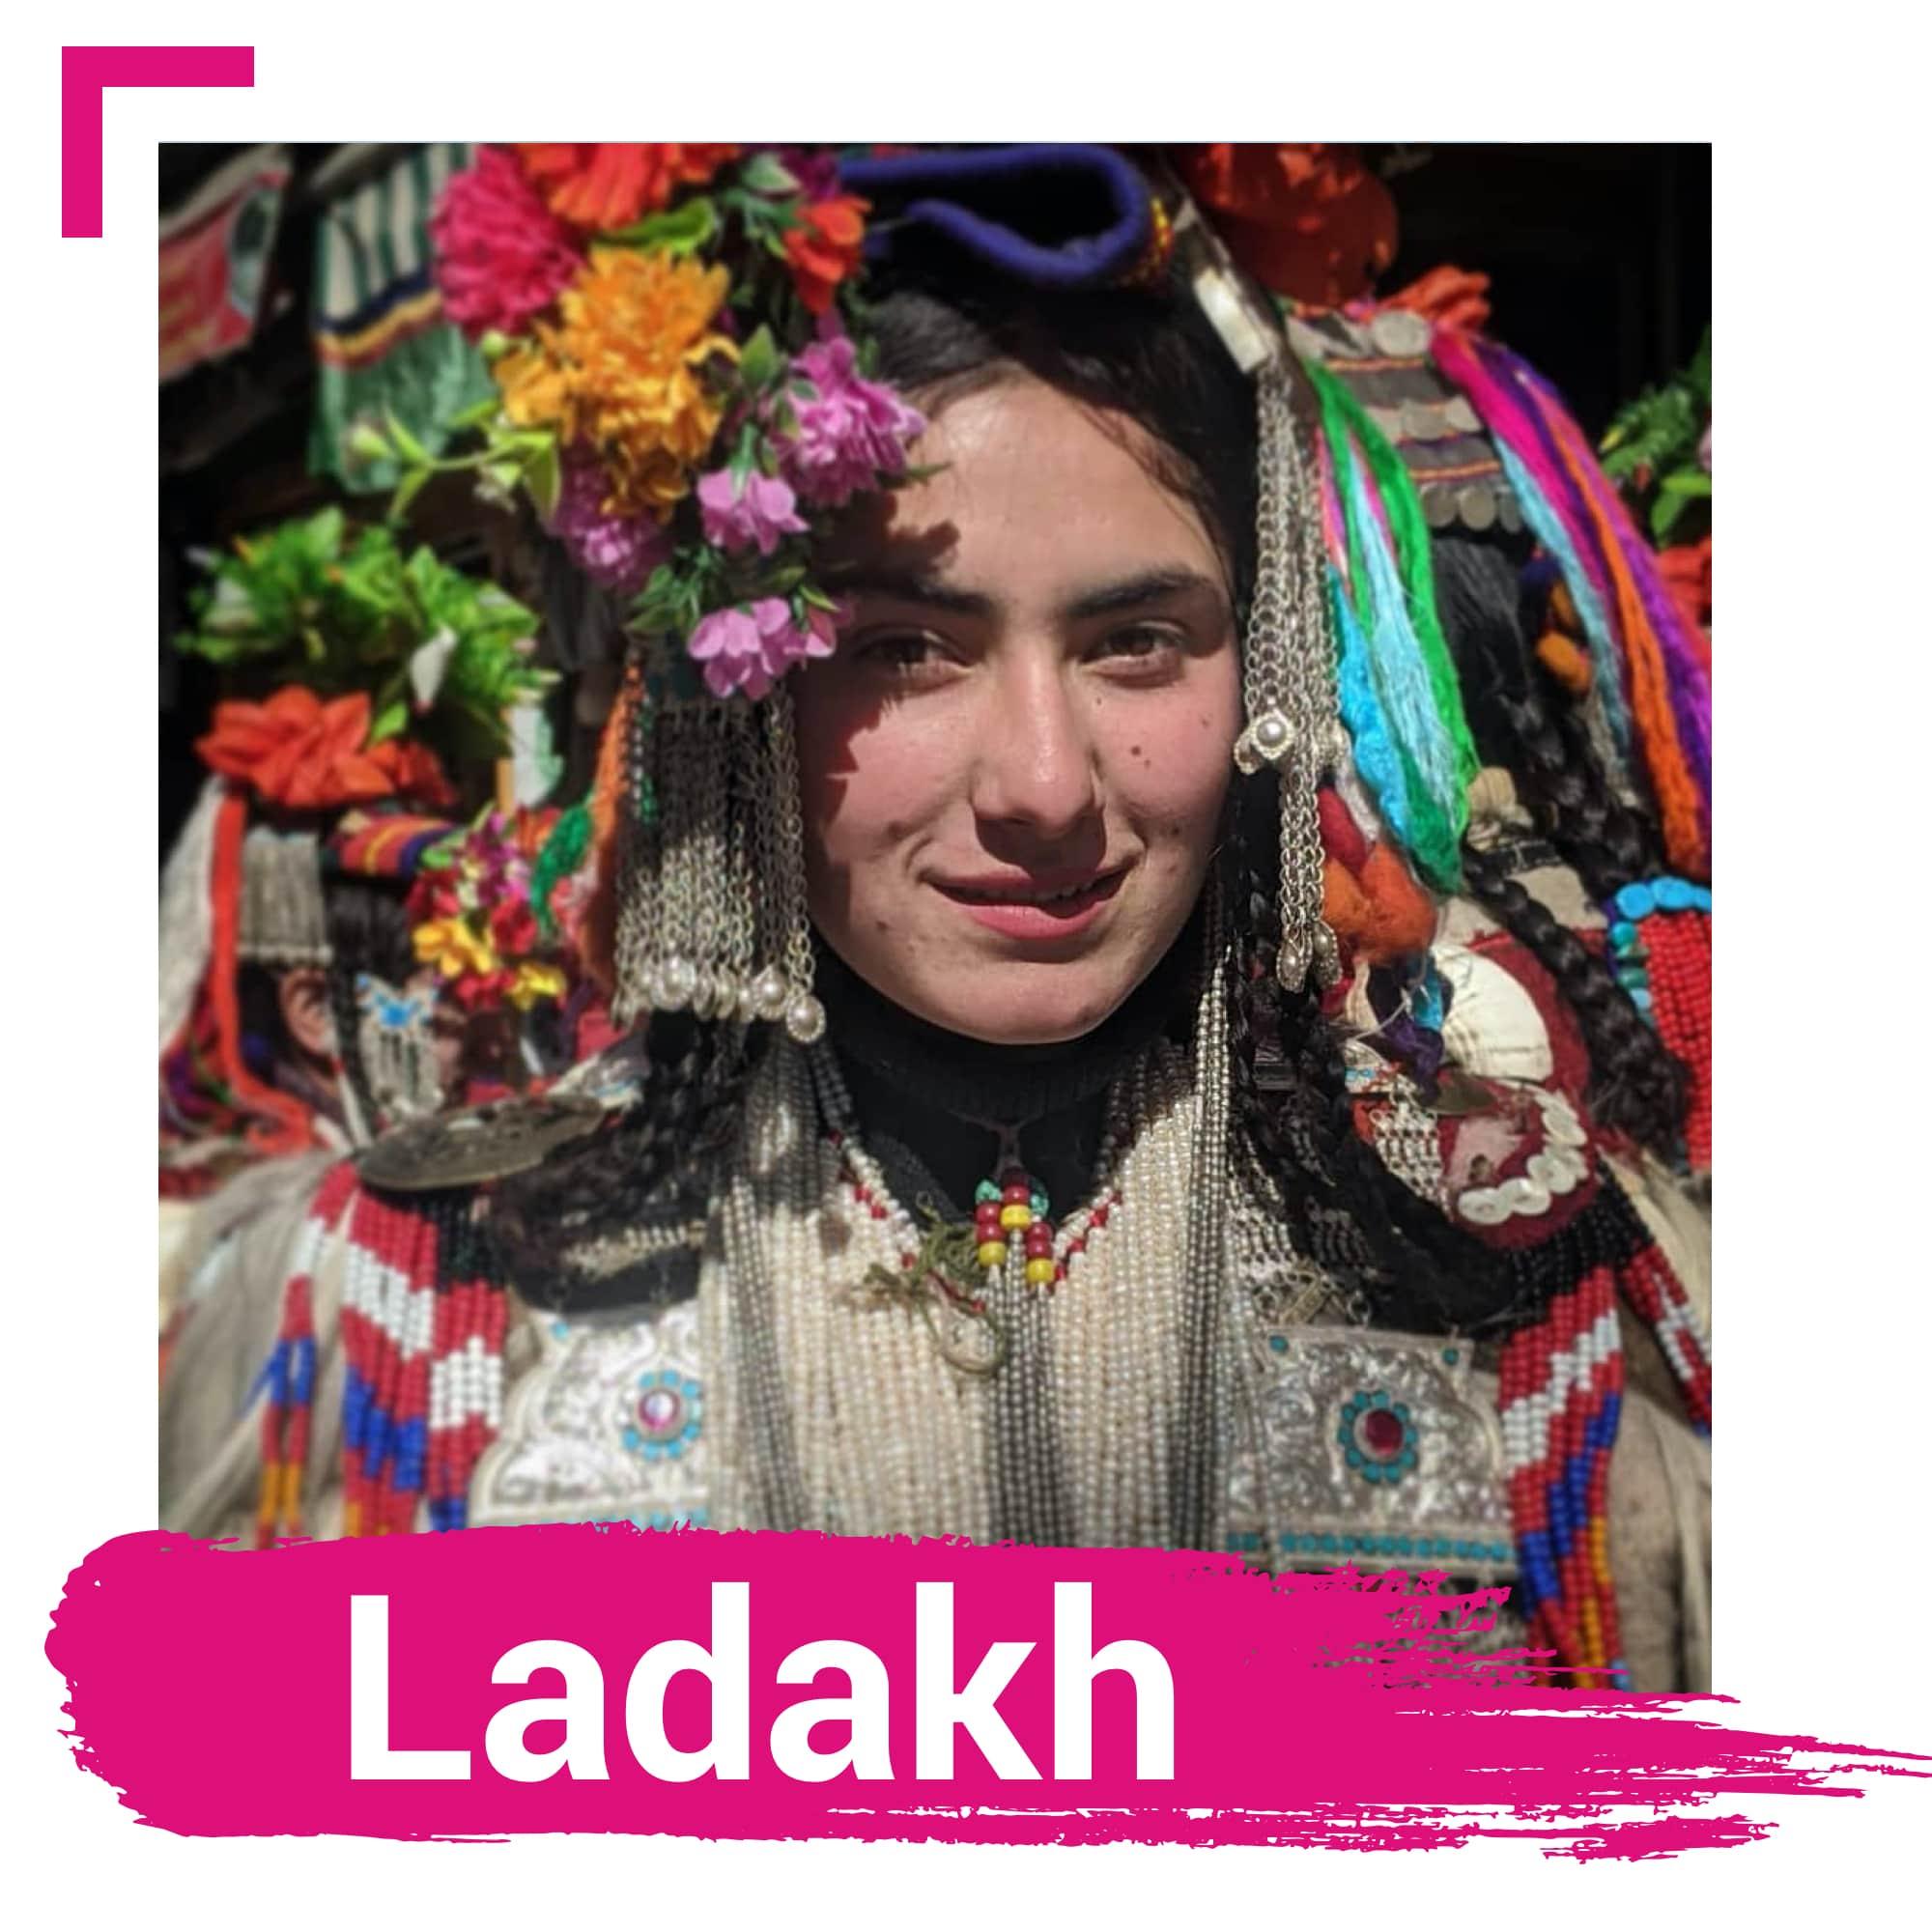 Hindistan'daki Ladakh